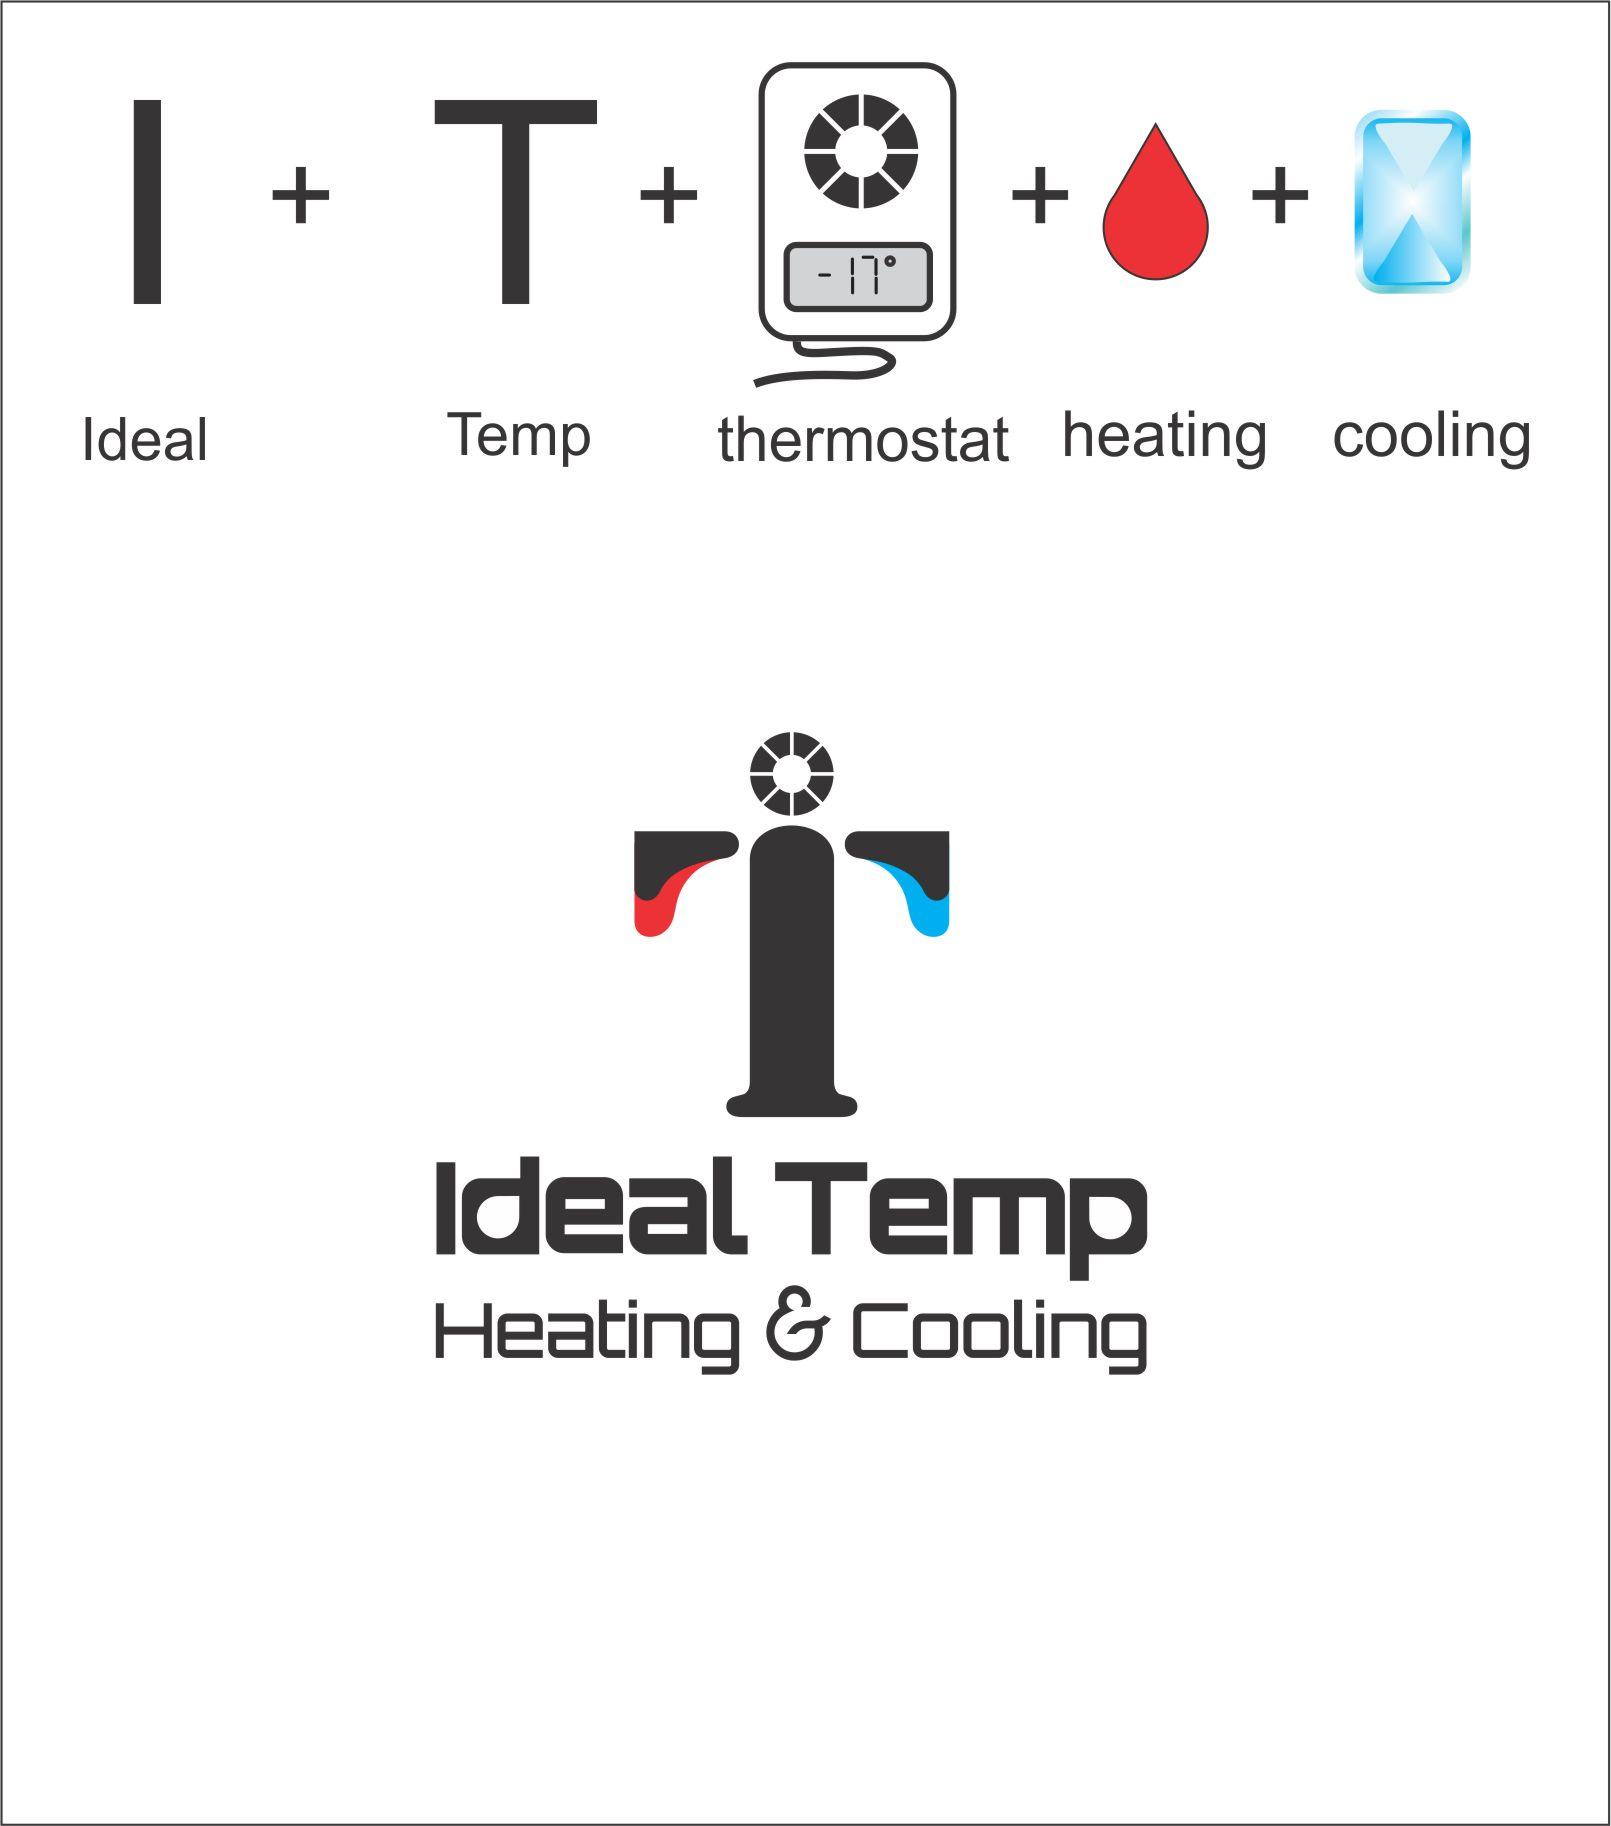 Logo Design by Nikola Kapunac - Entry No. 265 in the Logo Design Contest Captivating Logo Design for Ideal Temp.